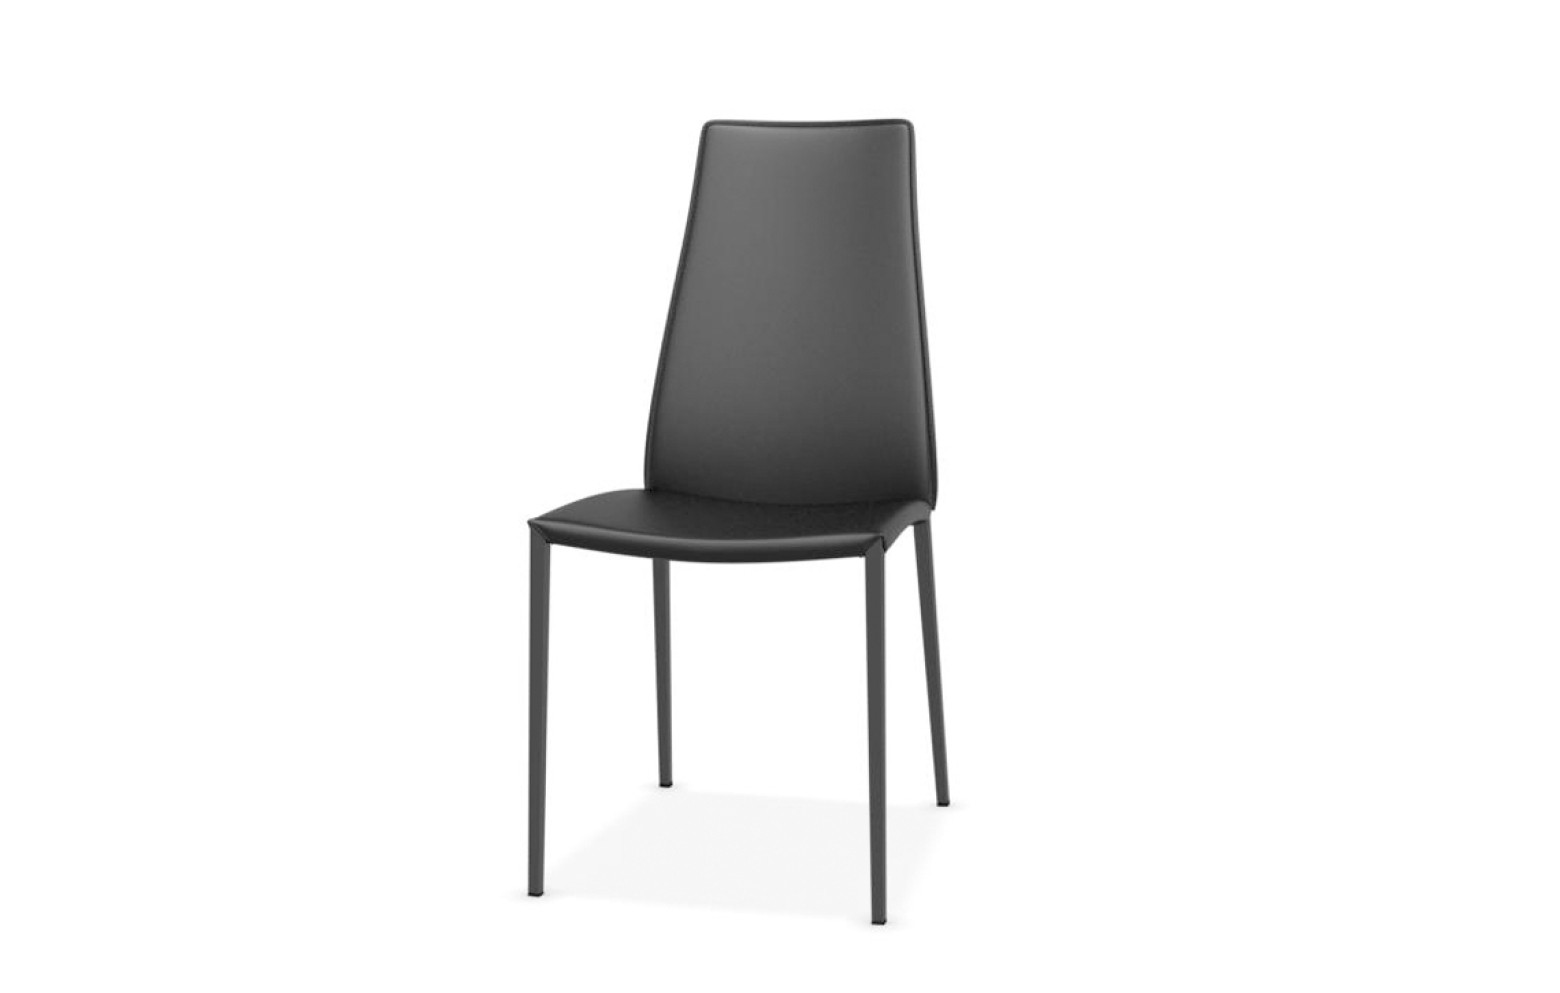 aida stuhl st hle b nke online outlet who 39 s perfect. Black Bedroom Furniture Sets. Home Design Ideas